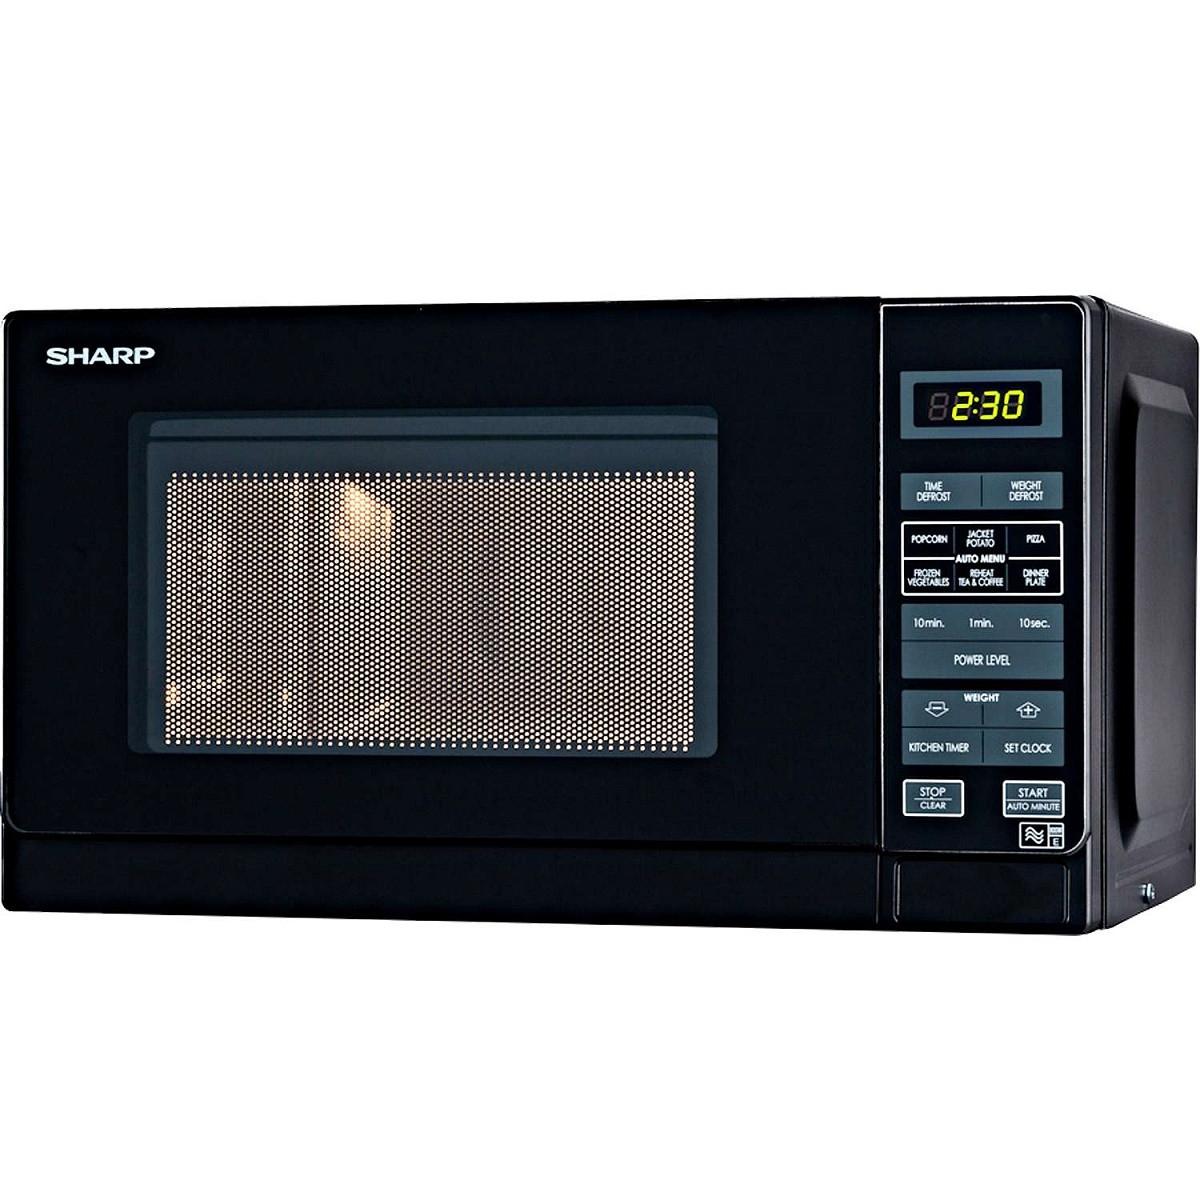 Sharp R272KM 20-Litre 800-Watt Microwave - Black